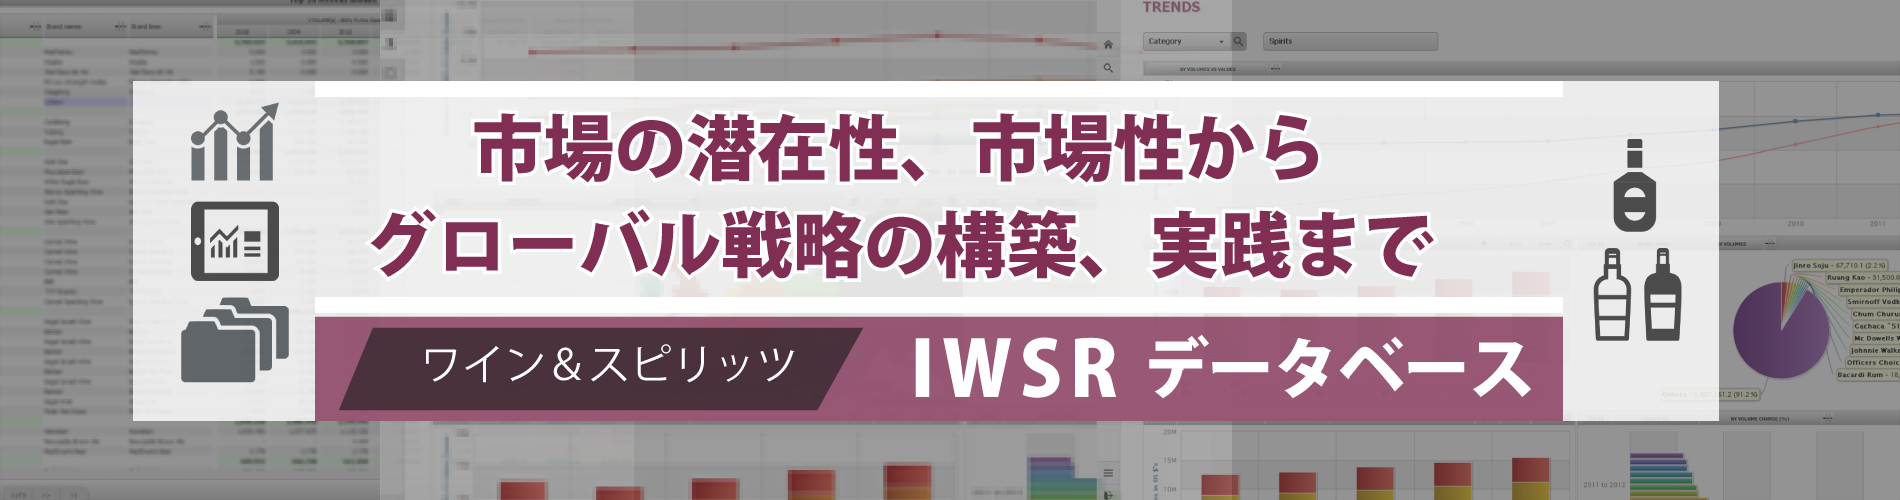 IWSRデータベース